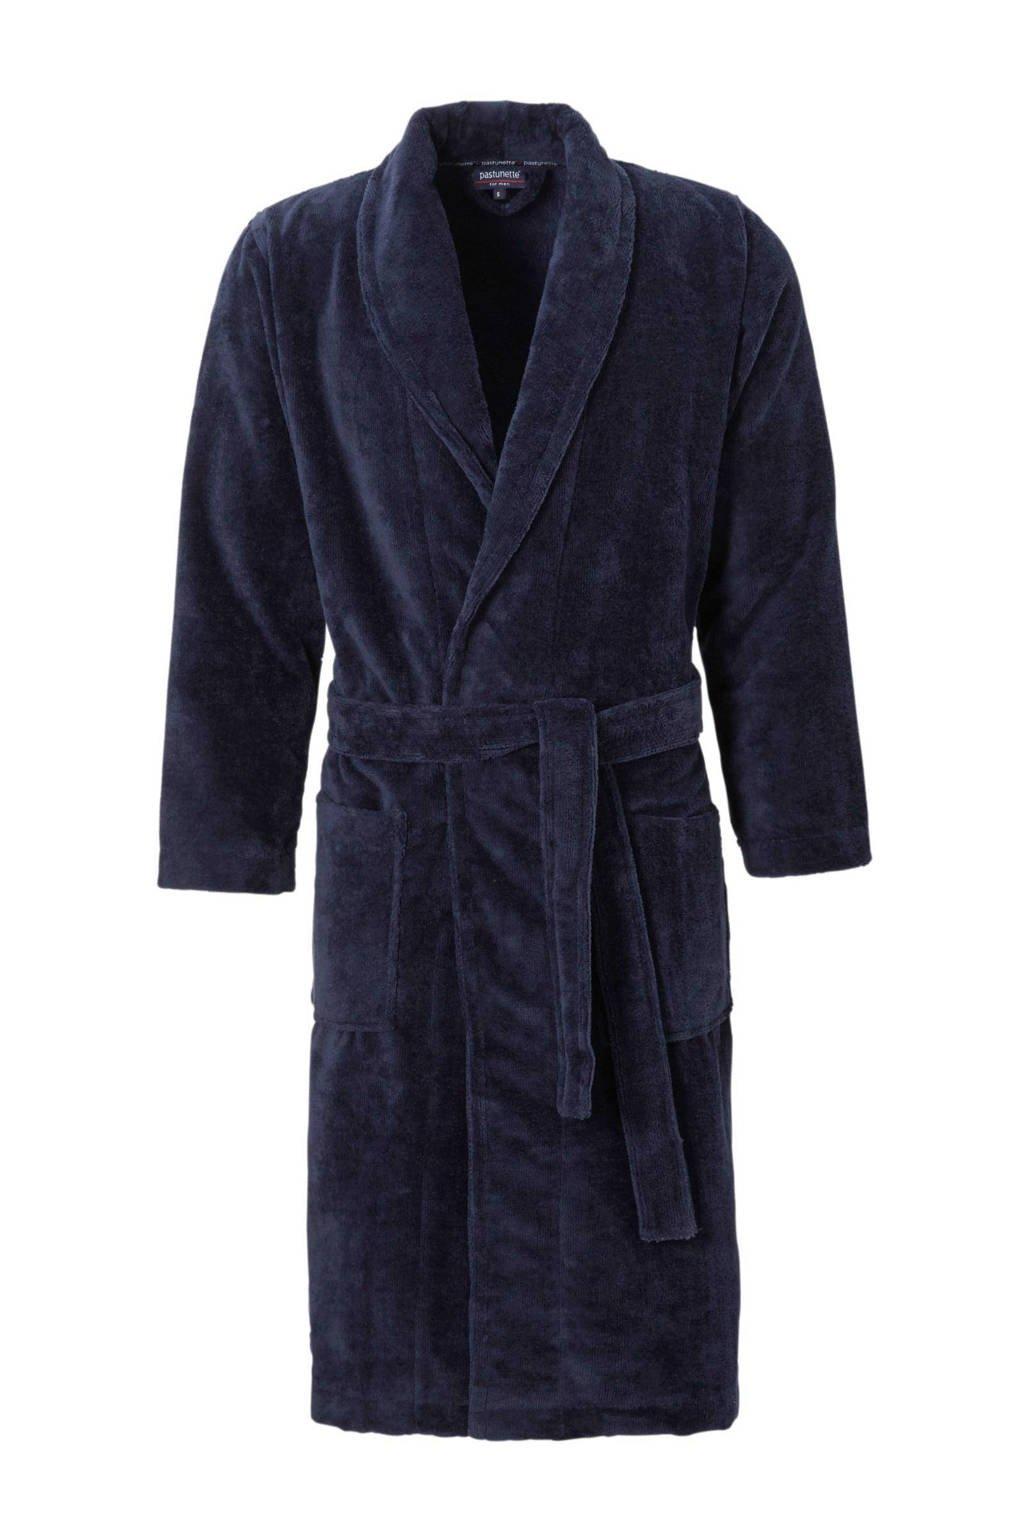 Union River badjas donkerblauw, Donkerblauw